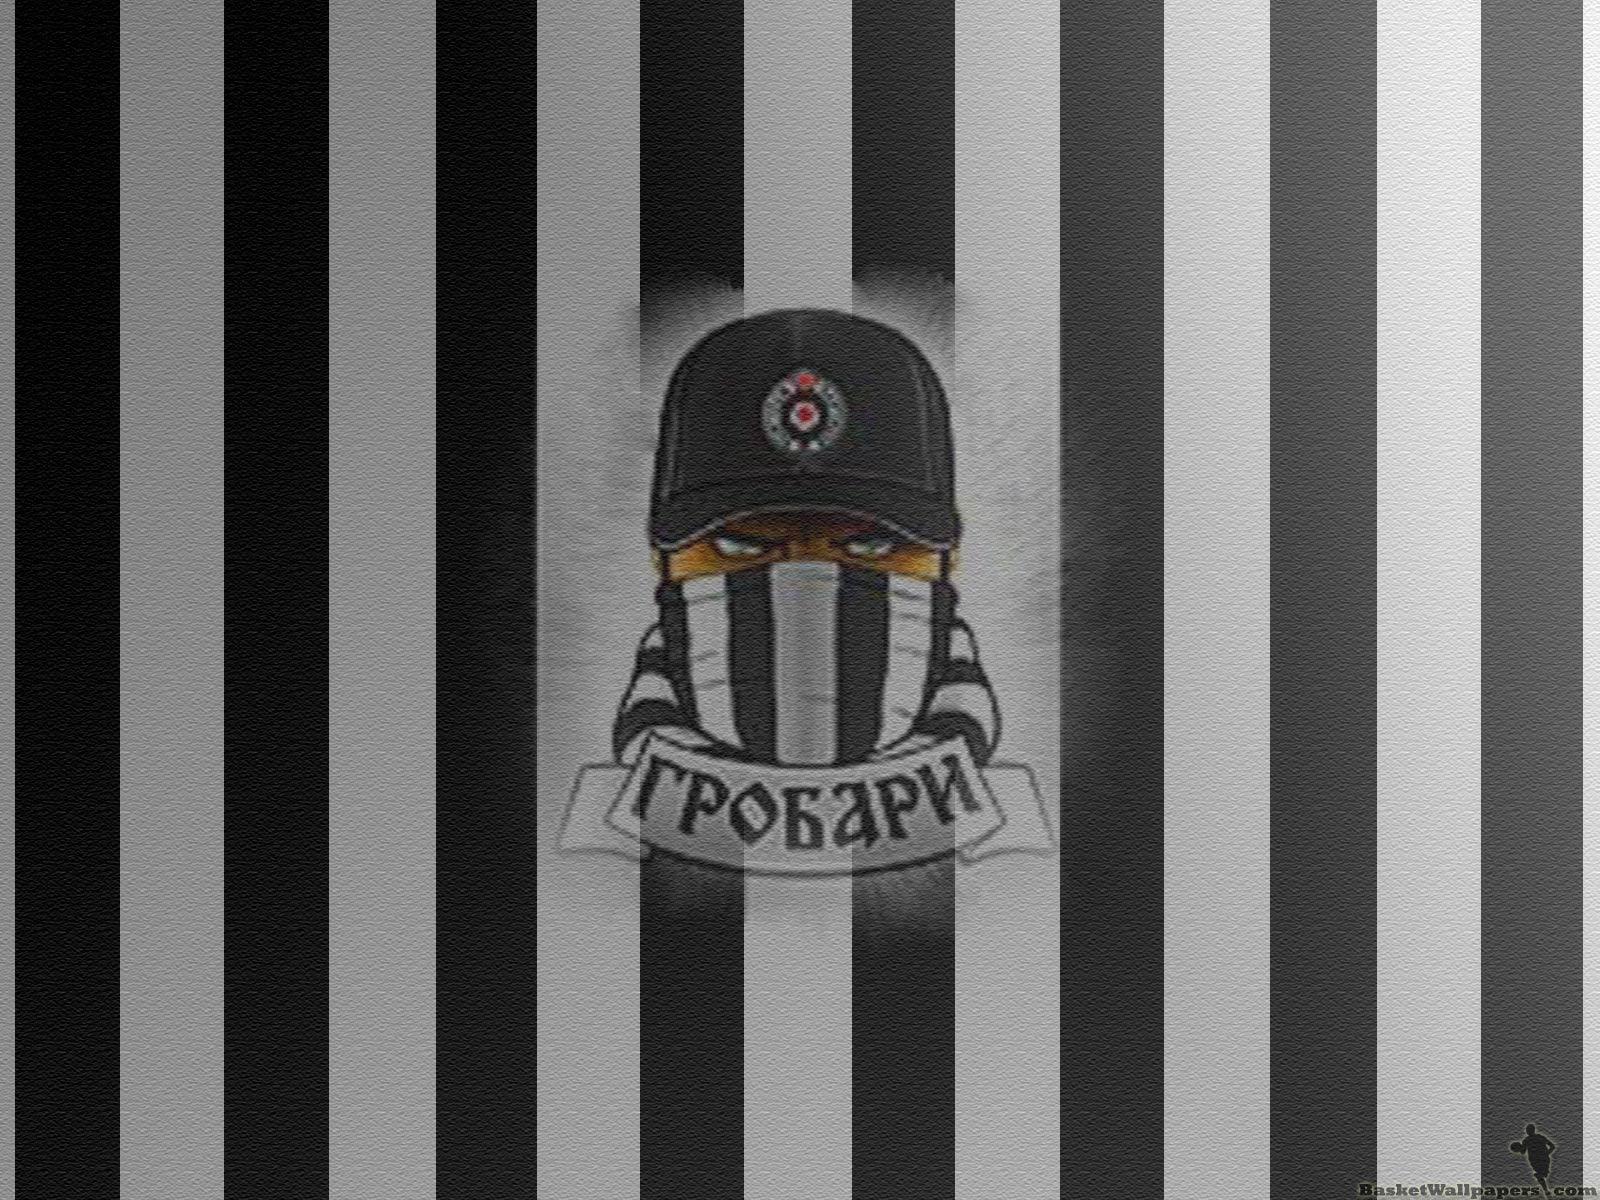 Lebron James Iphone Wallpaper Partizan Belgrade Grobari Wallpaper Basketball